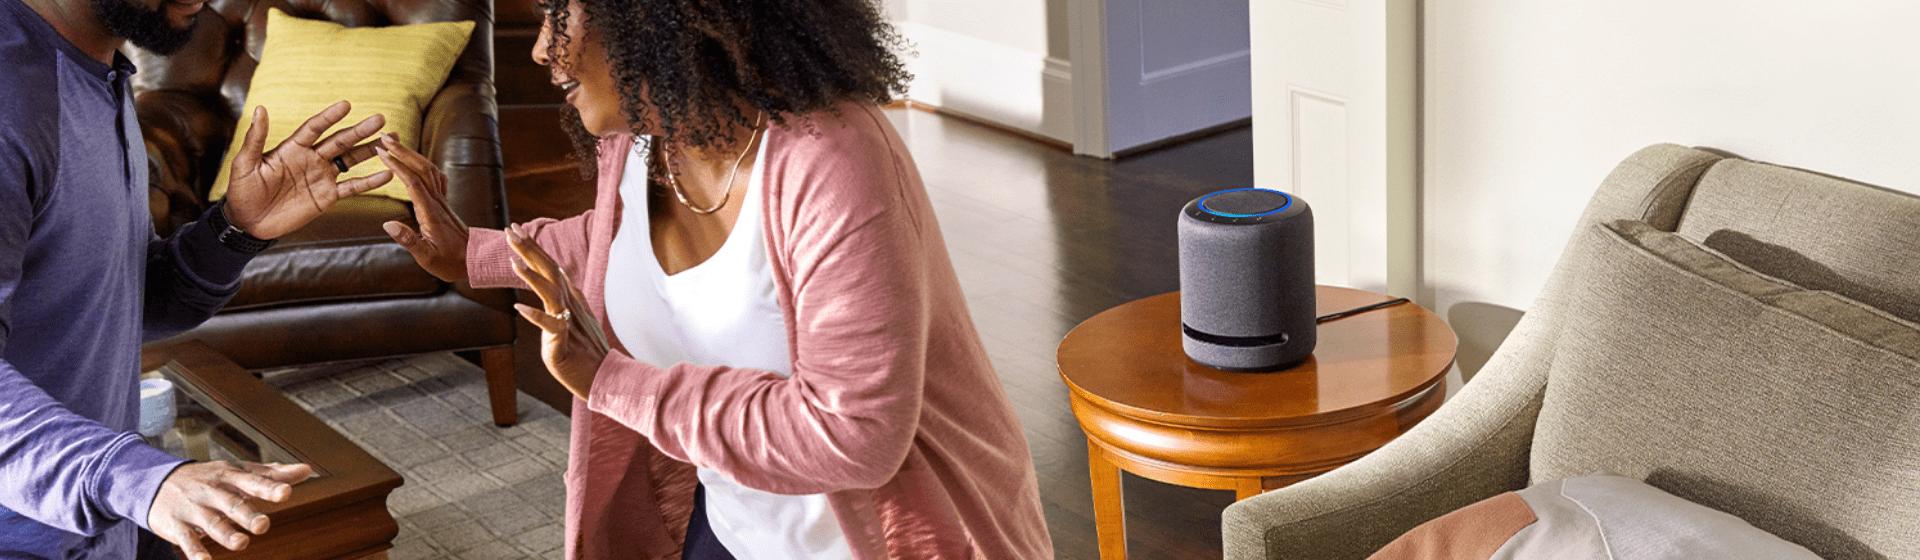 Echo Studio: veja a análise desse smart speaker da Amazon